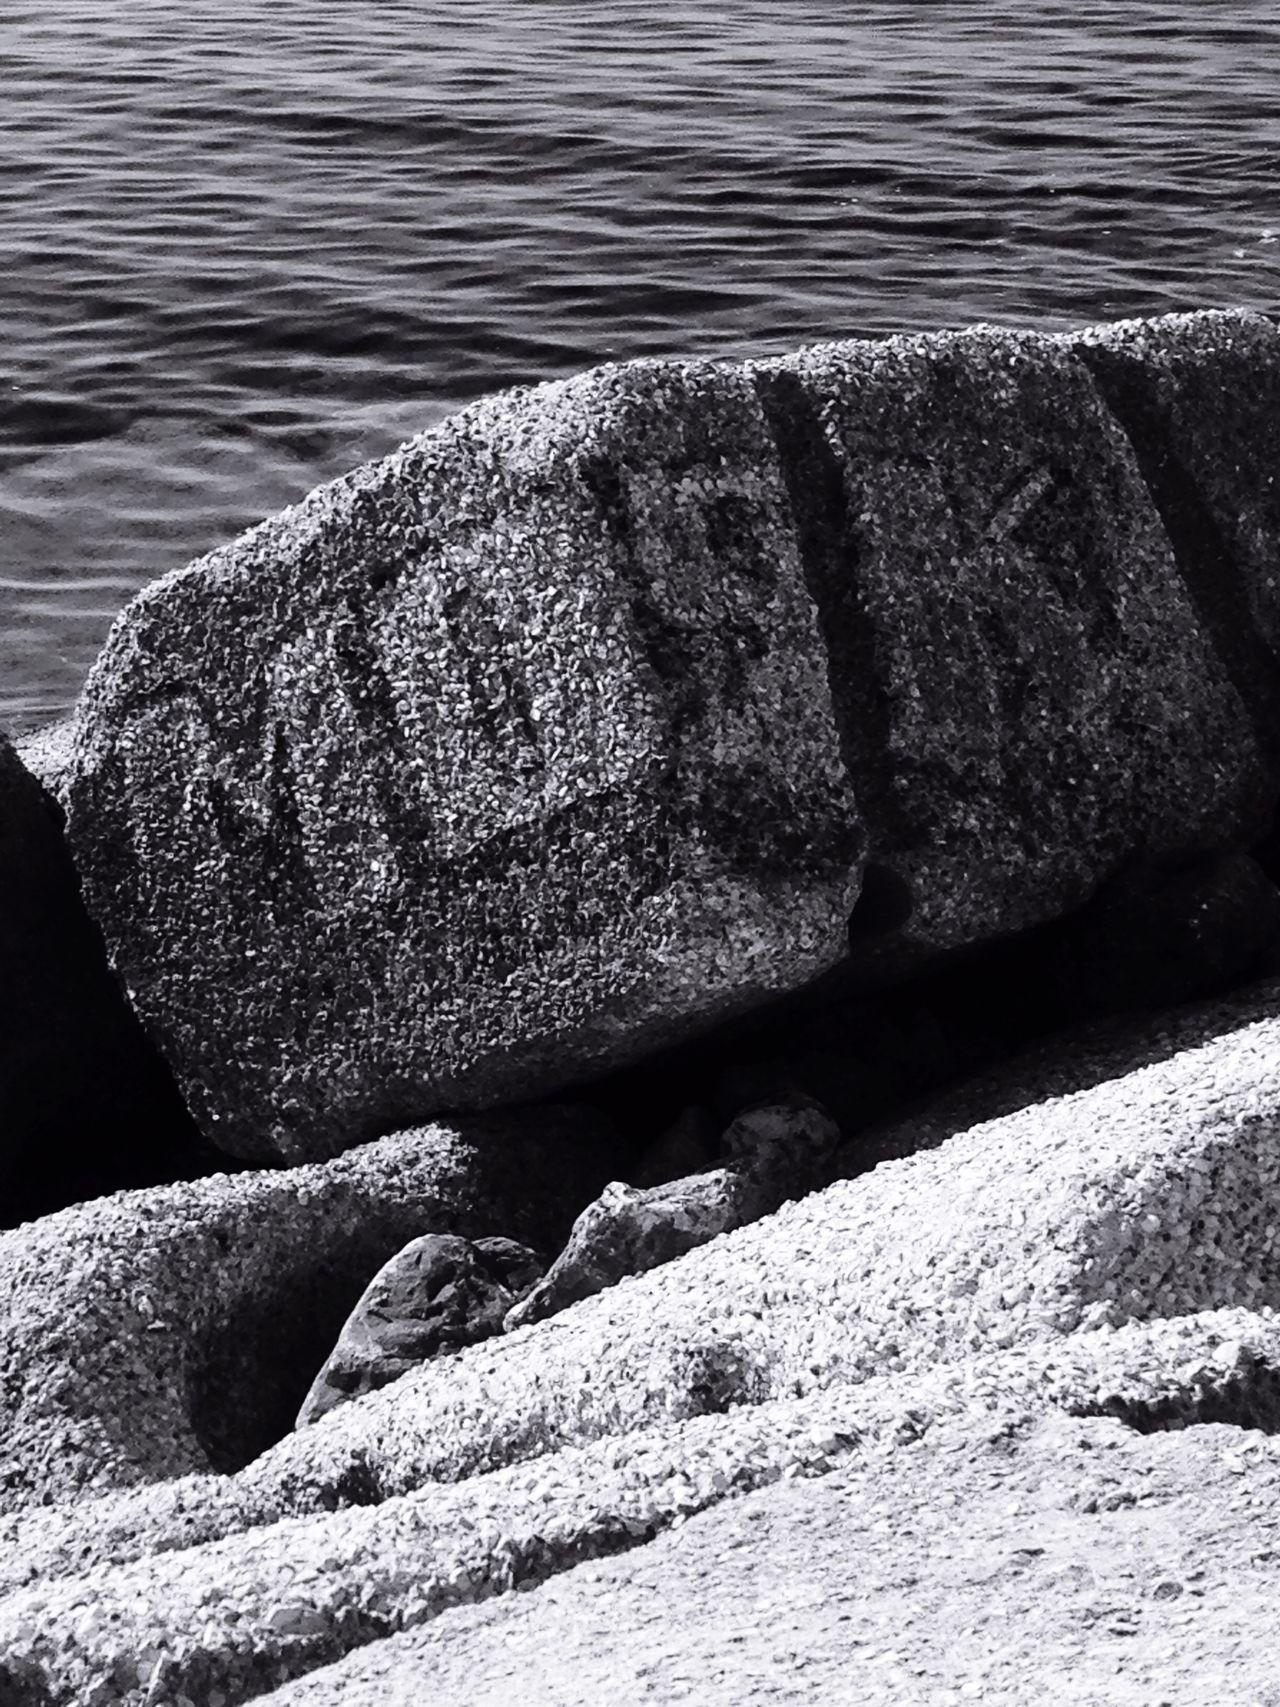 Taking Photos Writers Sea Concrete Black And White @ Ernesto Galizia Contemporary Art Sky